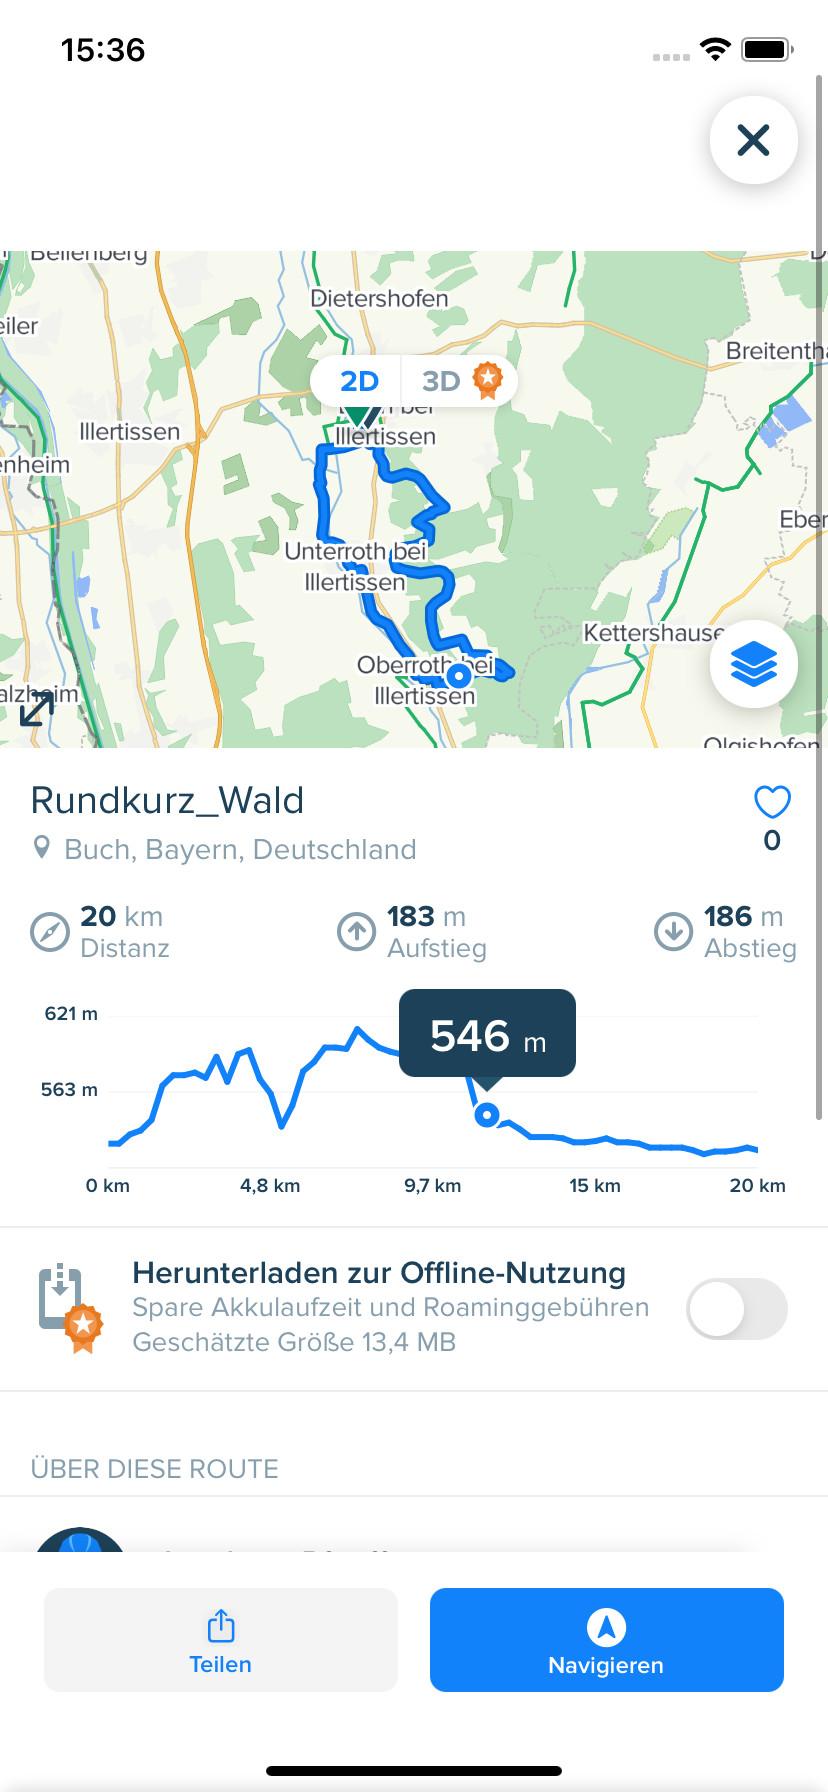 Screenshot 1 - Bikemap: Fahrradkarte & Navi (App für iPhone & iPad)